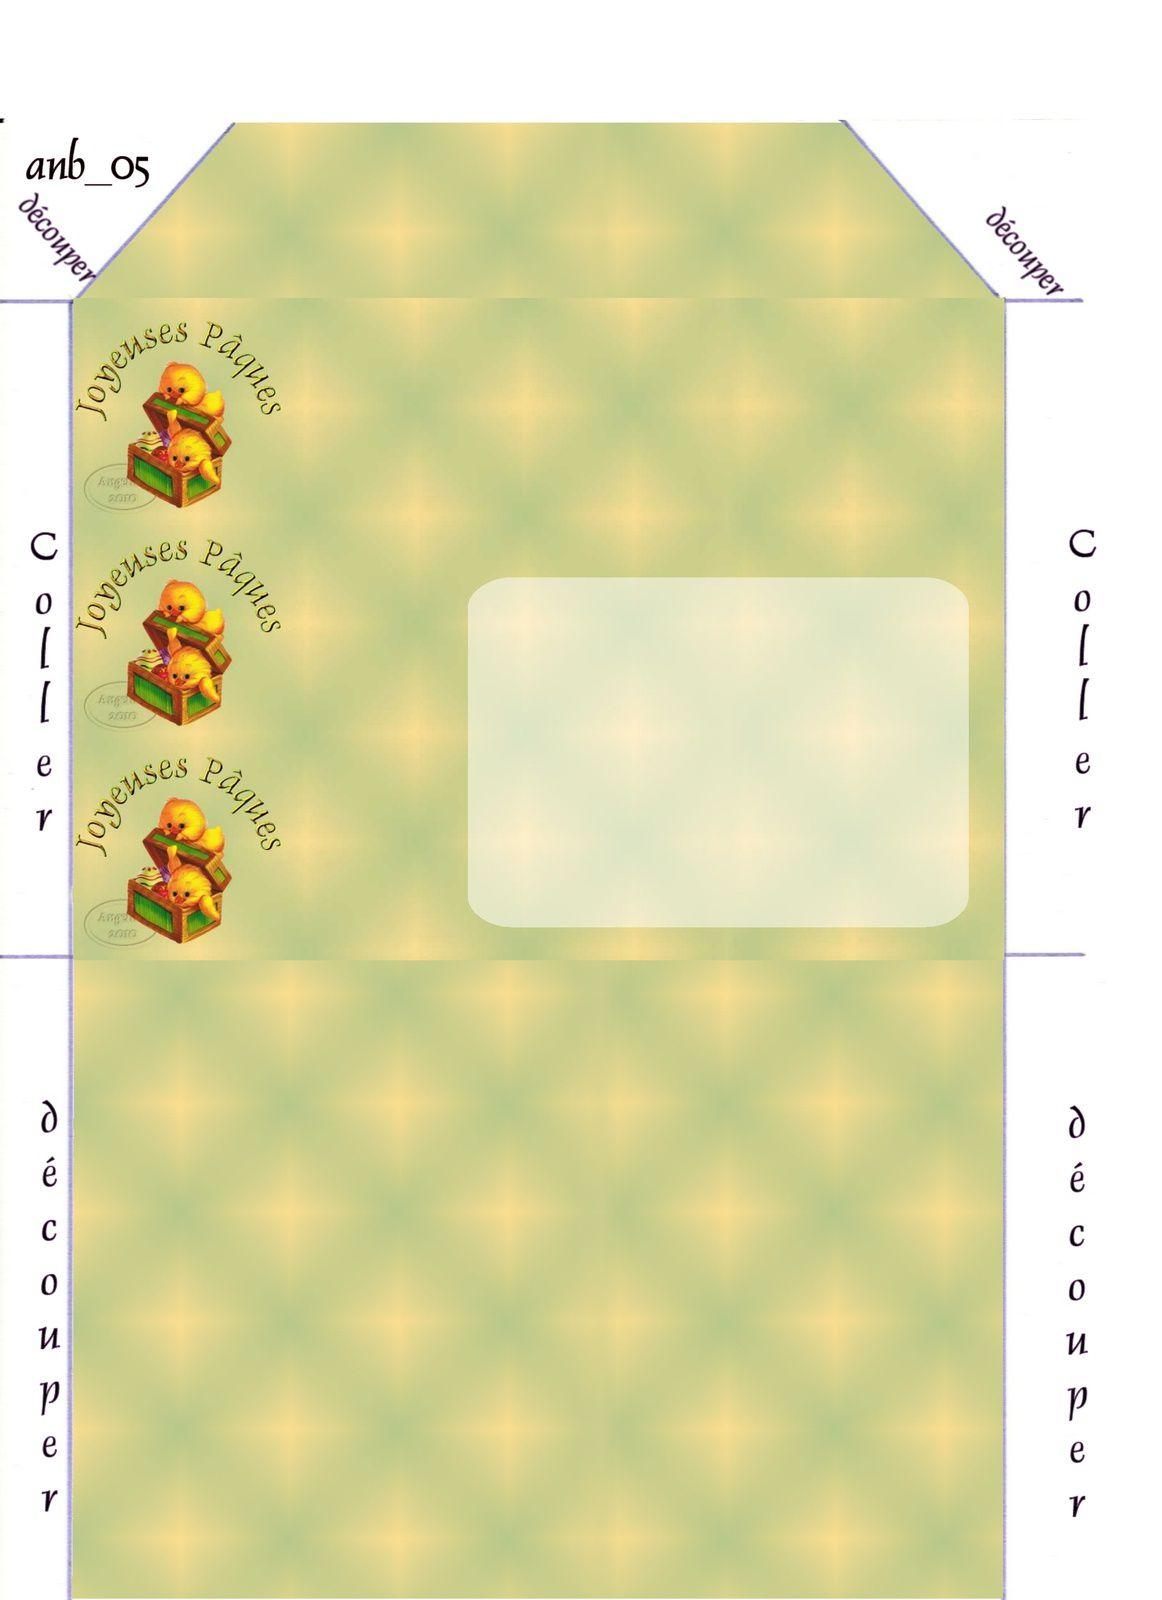 Joyeuses Pâques 41y840t Incredimail &amp&#x3B; Papier A4 h l &amp&#x3B; outlook &amp&#x3B; enveloppe &amp&#x3B; 2 cartes A5 &amp&#x3B; signets    joyeuses_paques_paques_41y840t61